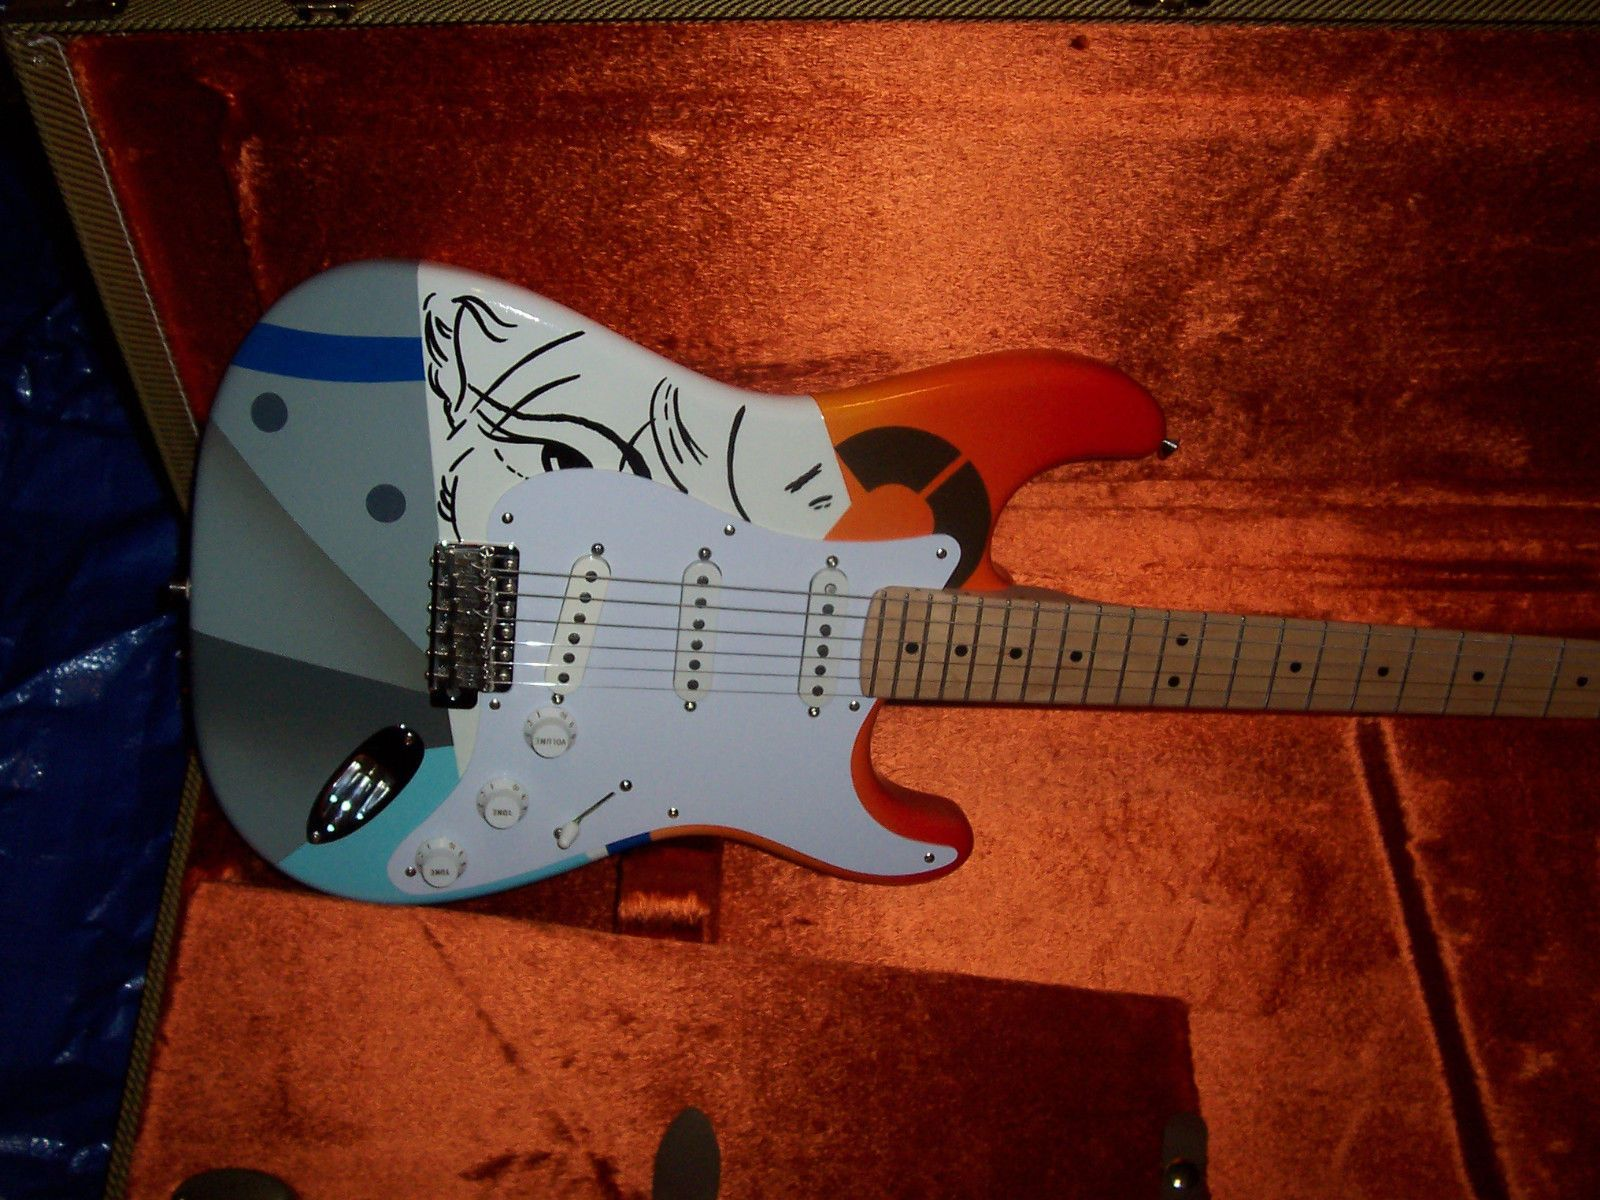 crash 1 eric clapton fender stratocaster guitar strat usa american vintage desig [ 1600 x 1200 Pixel ]